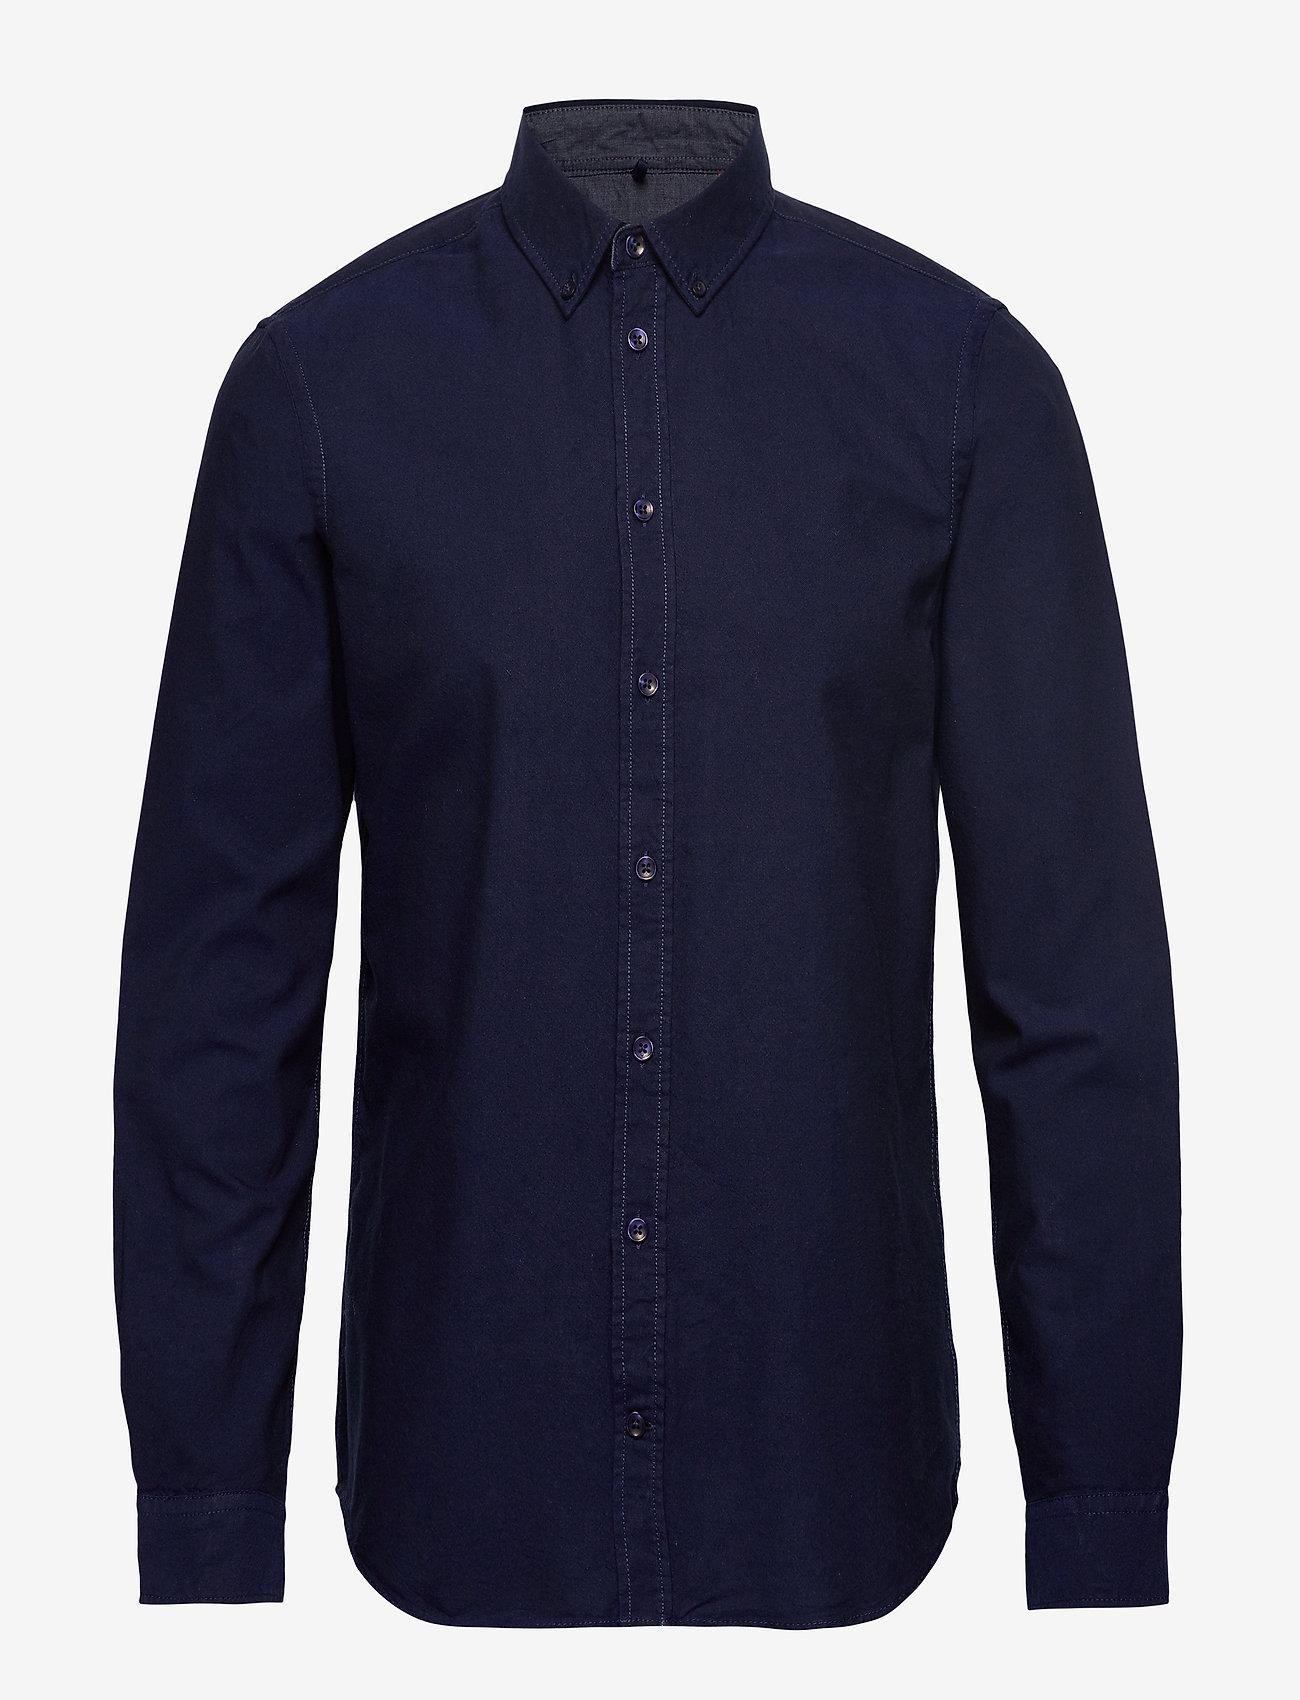 Blend - BHNAIL shirt Slim Fit - peruspaitoja - navy - 0